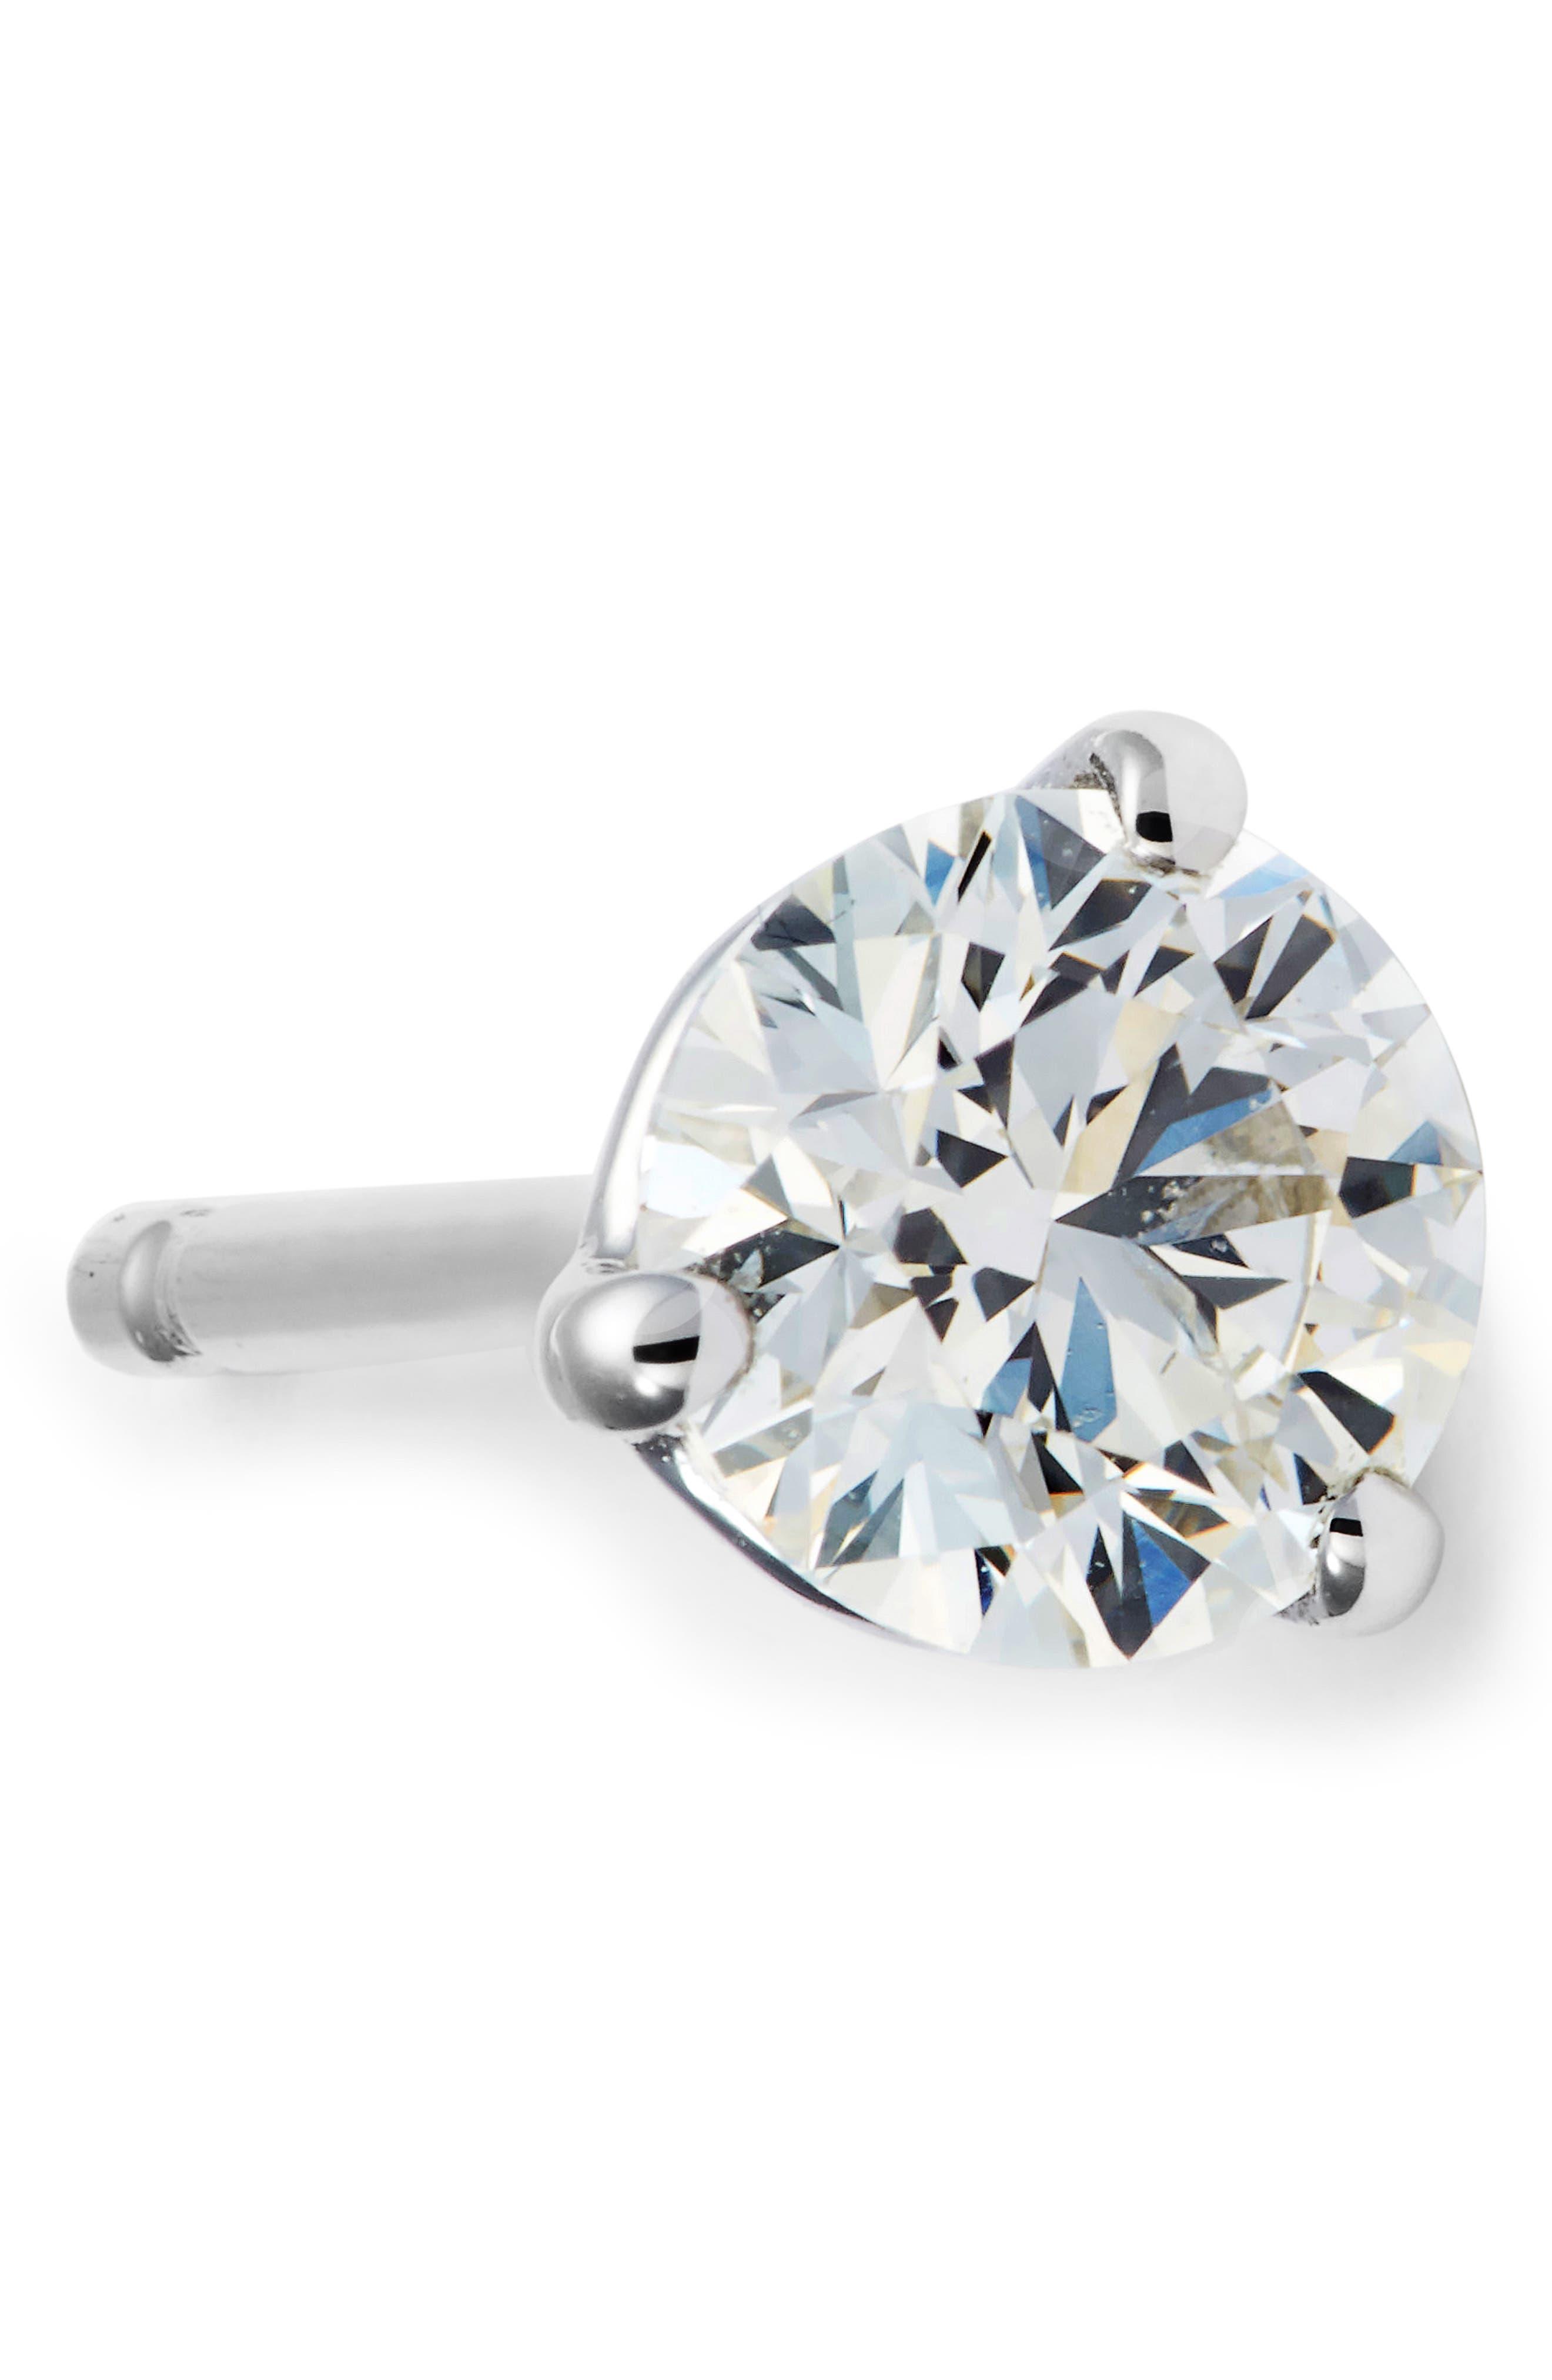 Single Diamond Stud Earring,                             Alternate thumbnail 7, color,                             WHITE GOLD